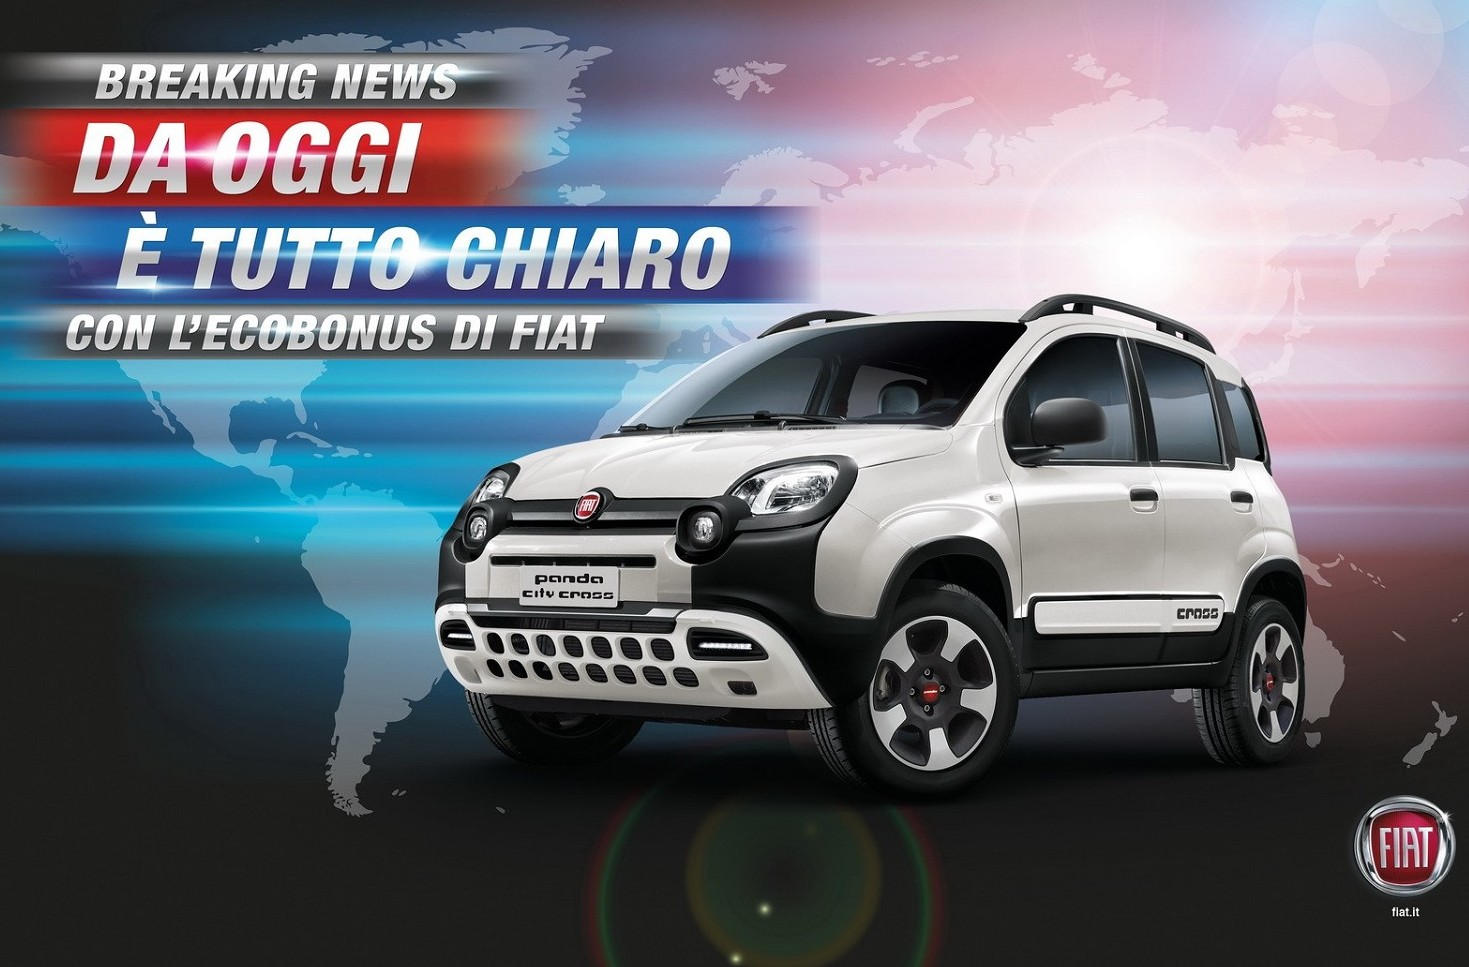 Fiat 500, Fiat Panda 2019, Jeep Renegade